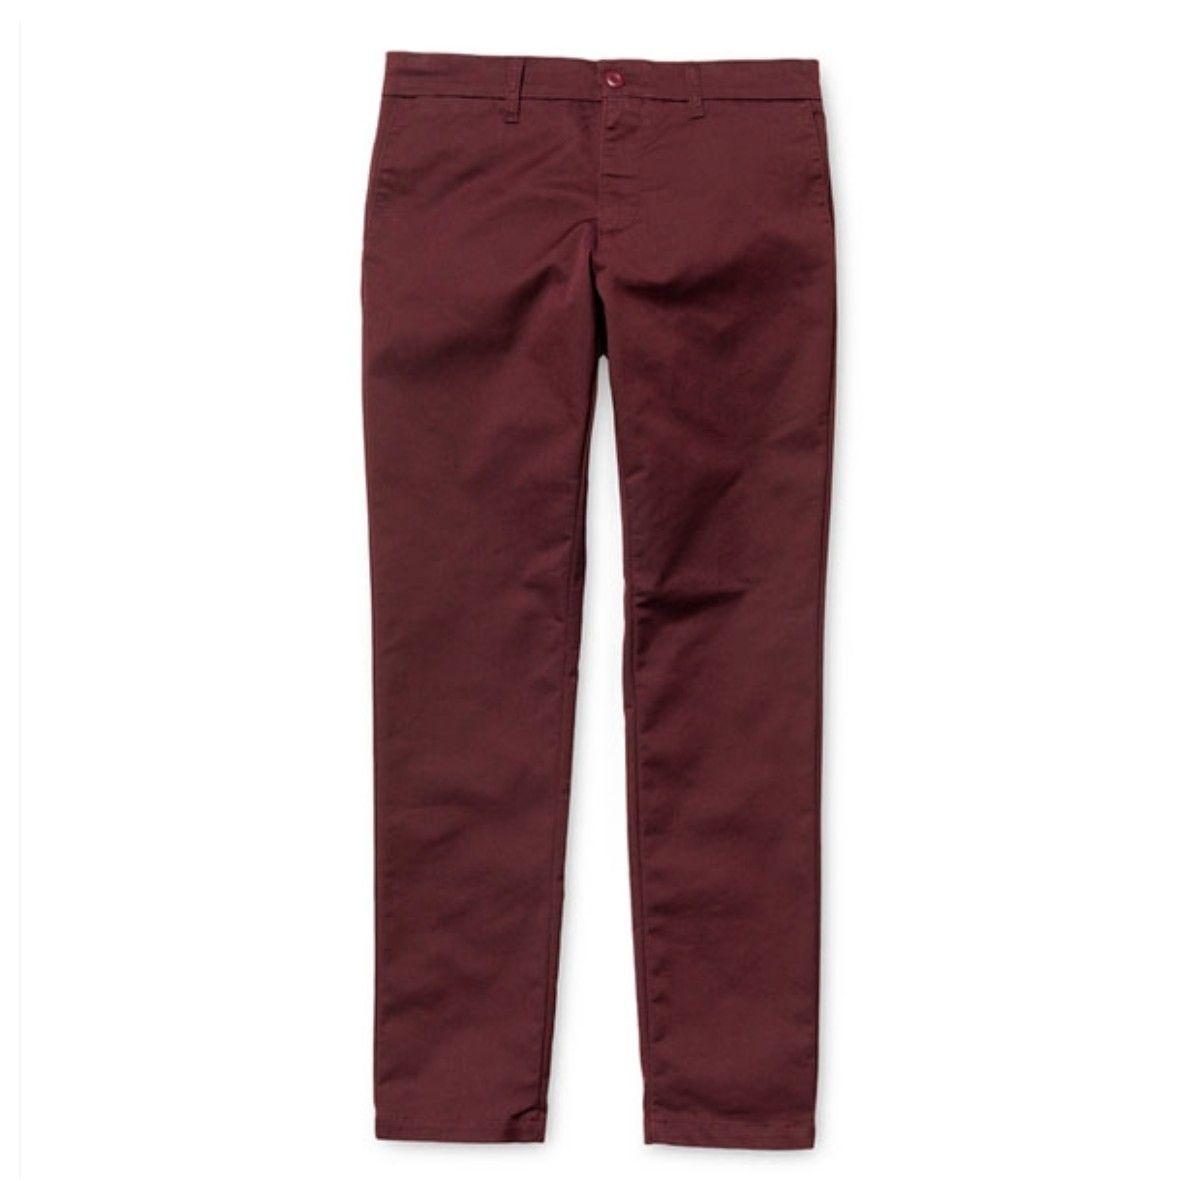 Pantalon SID PANT 32